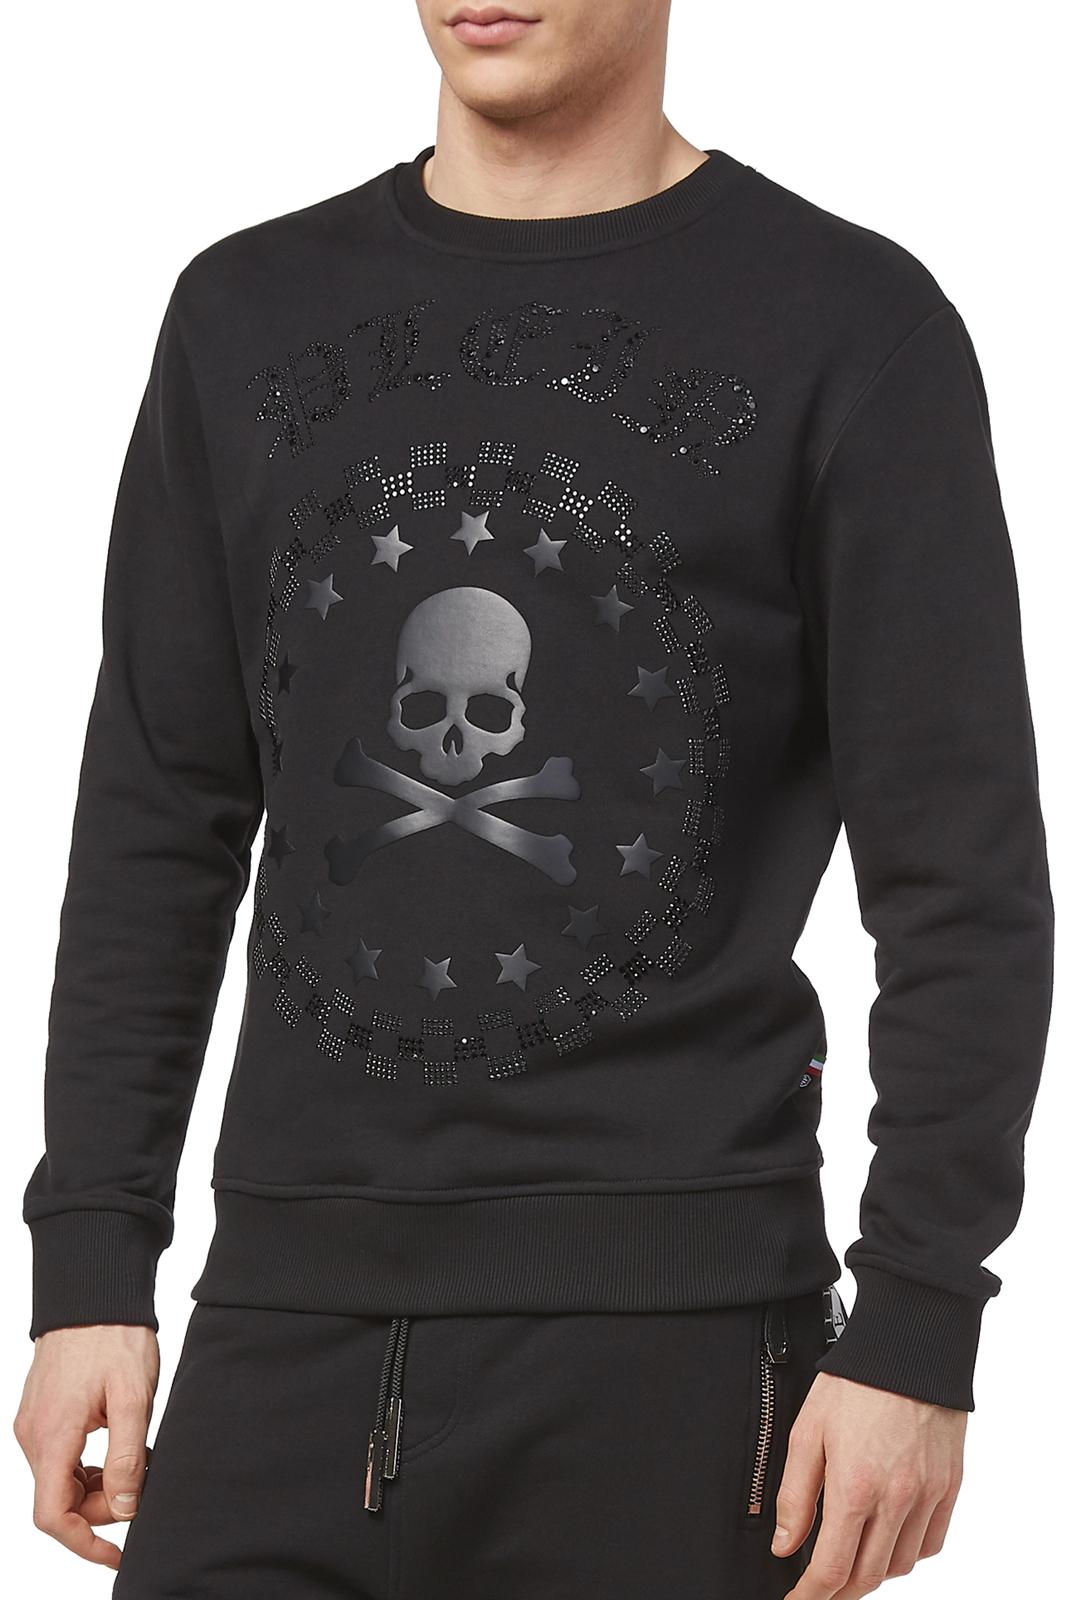 Sweatshirts  Philipp plein P18C MJO0333 BULLET 0202 BLACK/BLACK